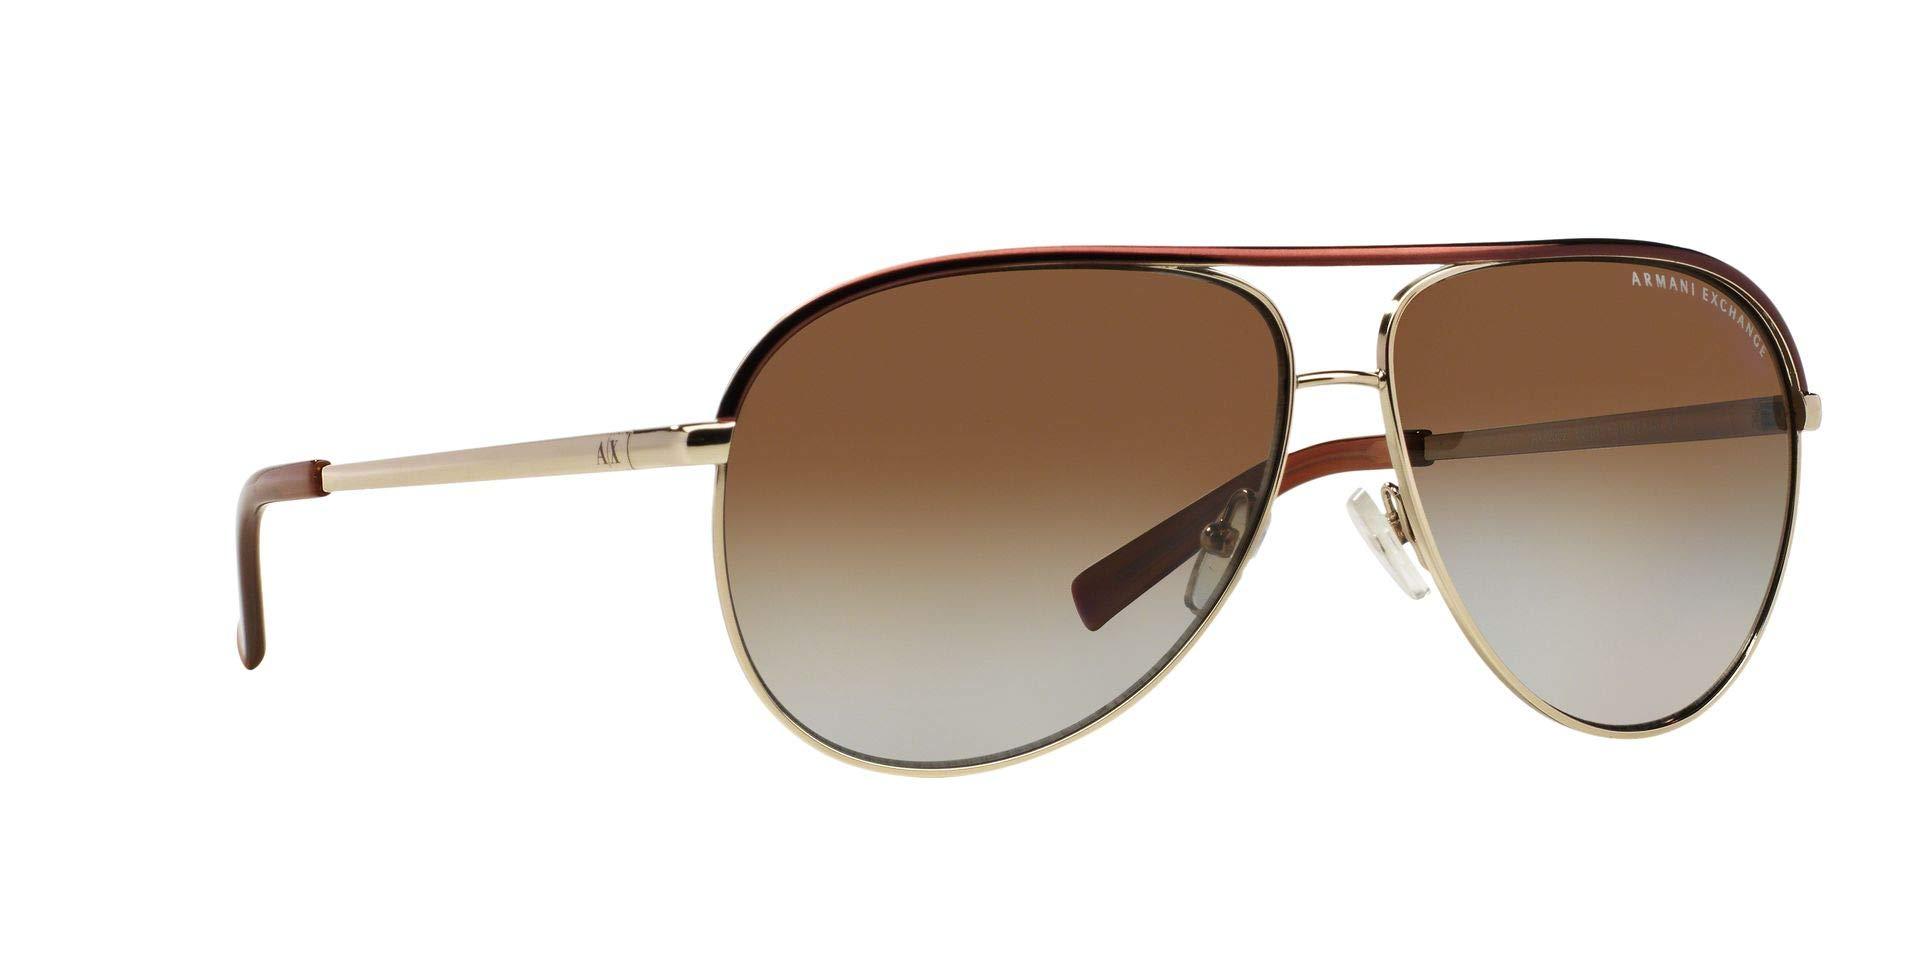 Armani Exchange Metal Unisex Polarized Aviator Sunglasses, Light Gold/Dark Brown, 61 mm by A|X Armani Exchange (Image #13)